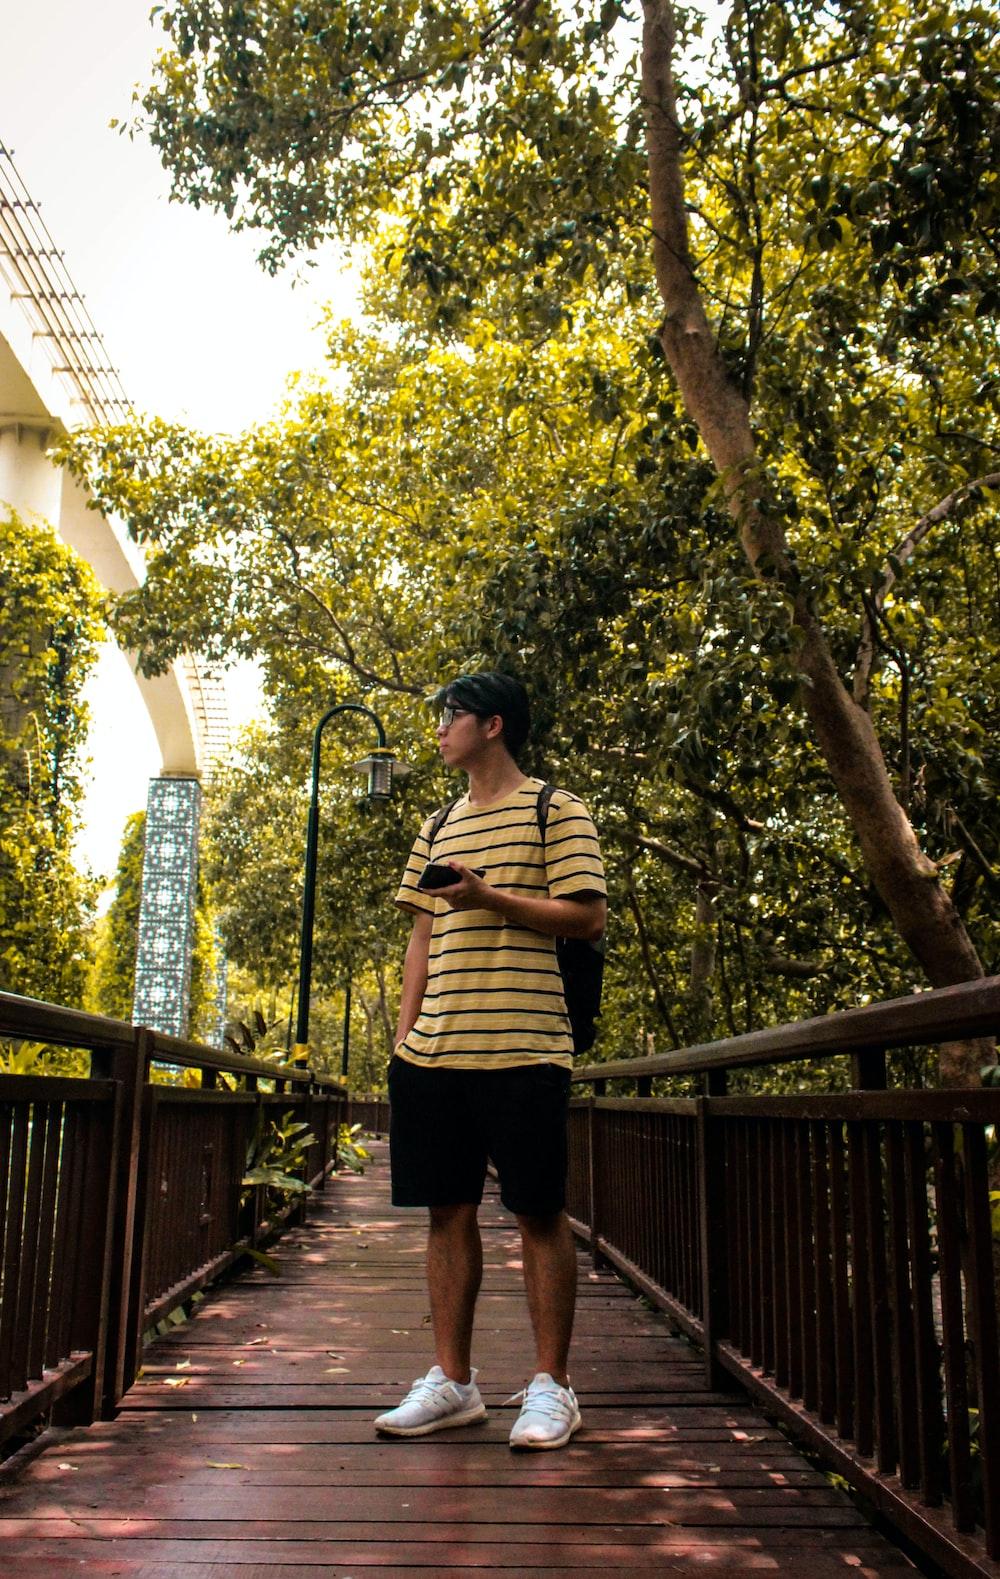 standing man wearing black and yellow striped shirt beside tree